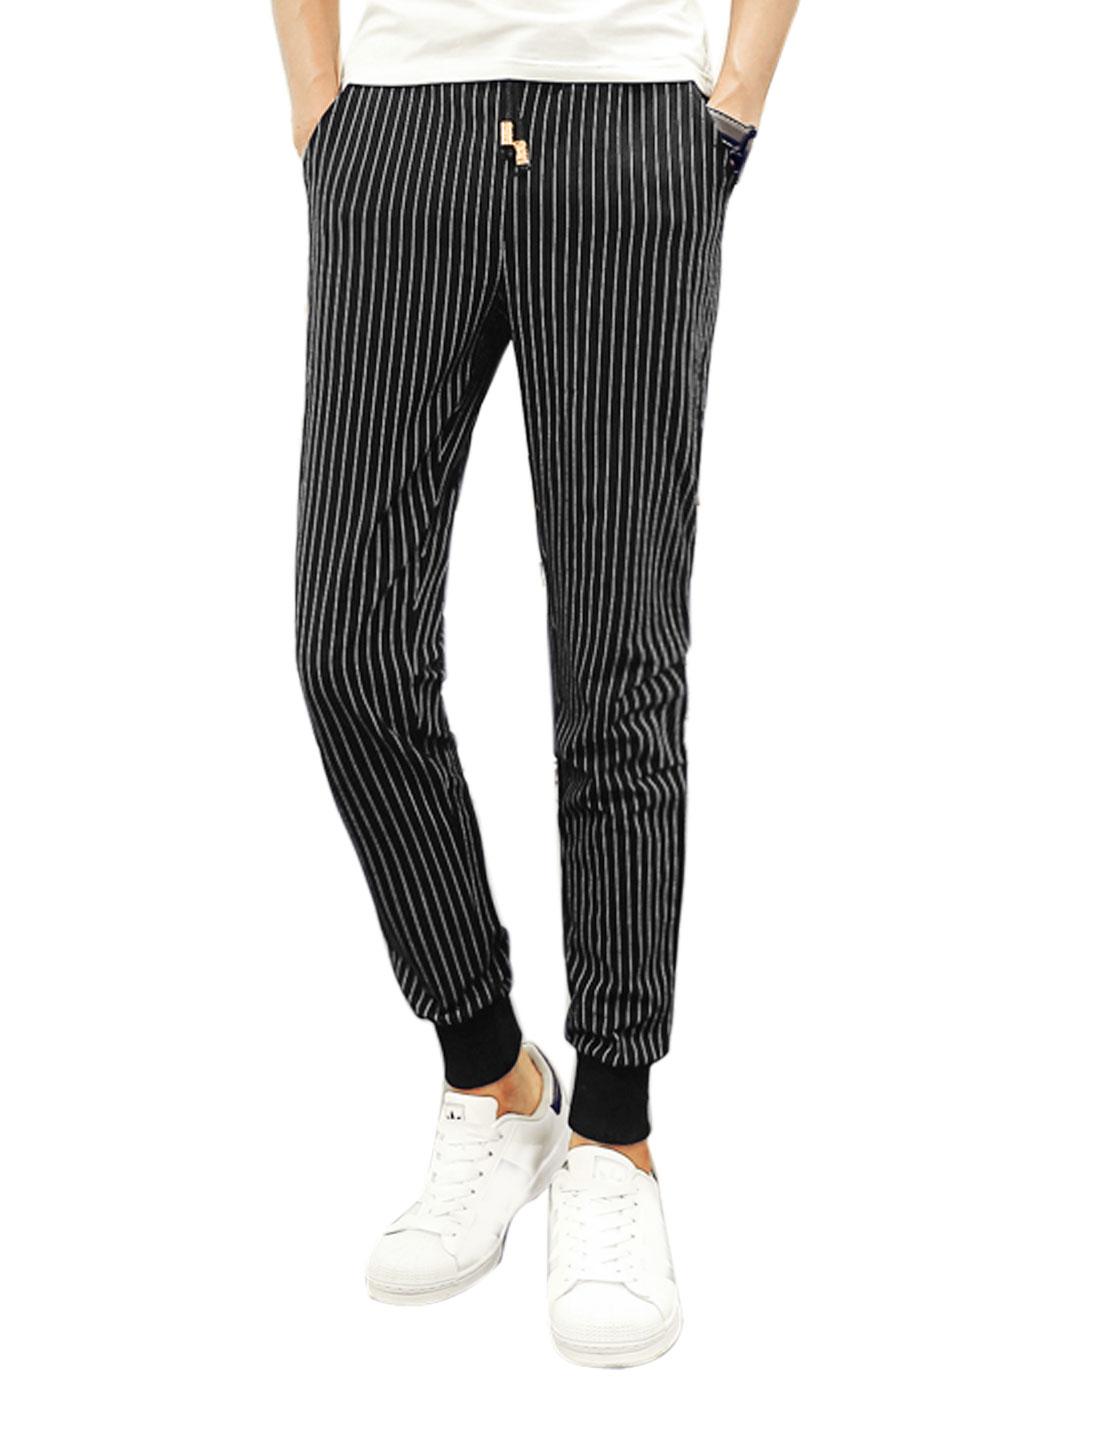 Men Drawstring Waist Stripes Tapered Casual Pants Black W30